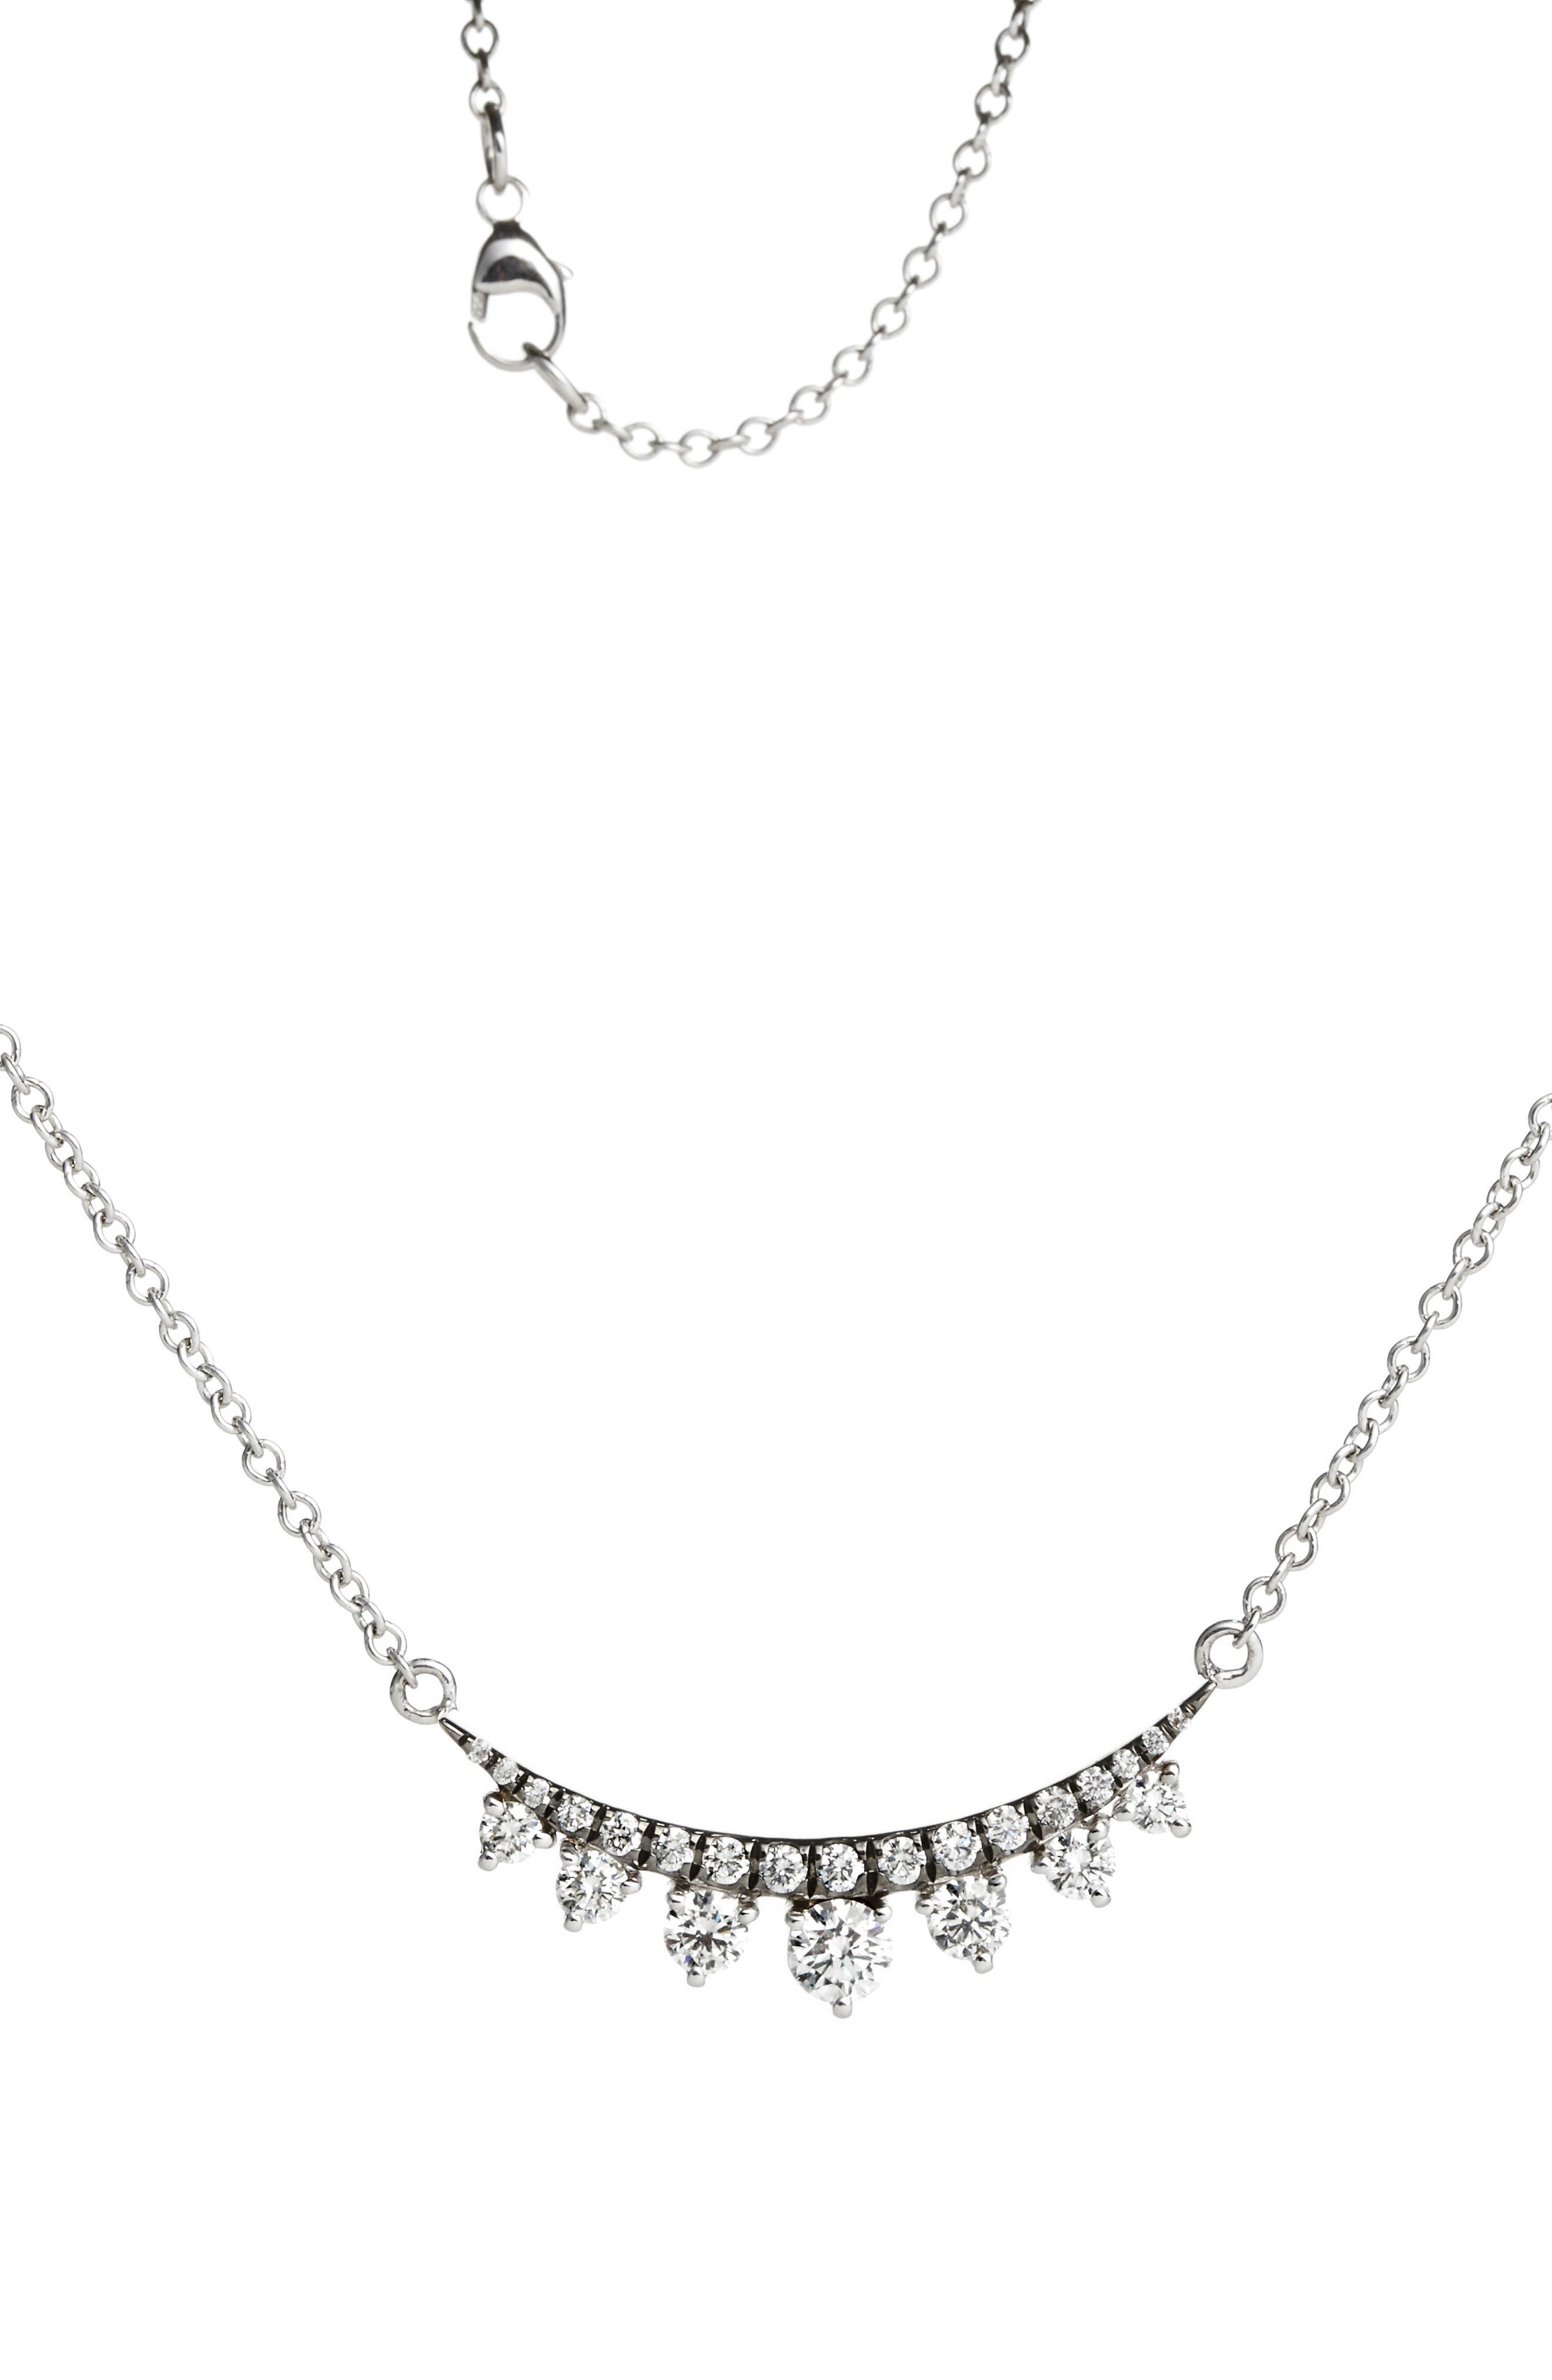 Prive Luxe 18K White Gold & Diamond Necklace,                         Main,                         color, 710